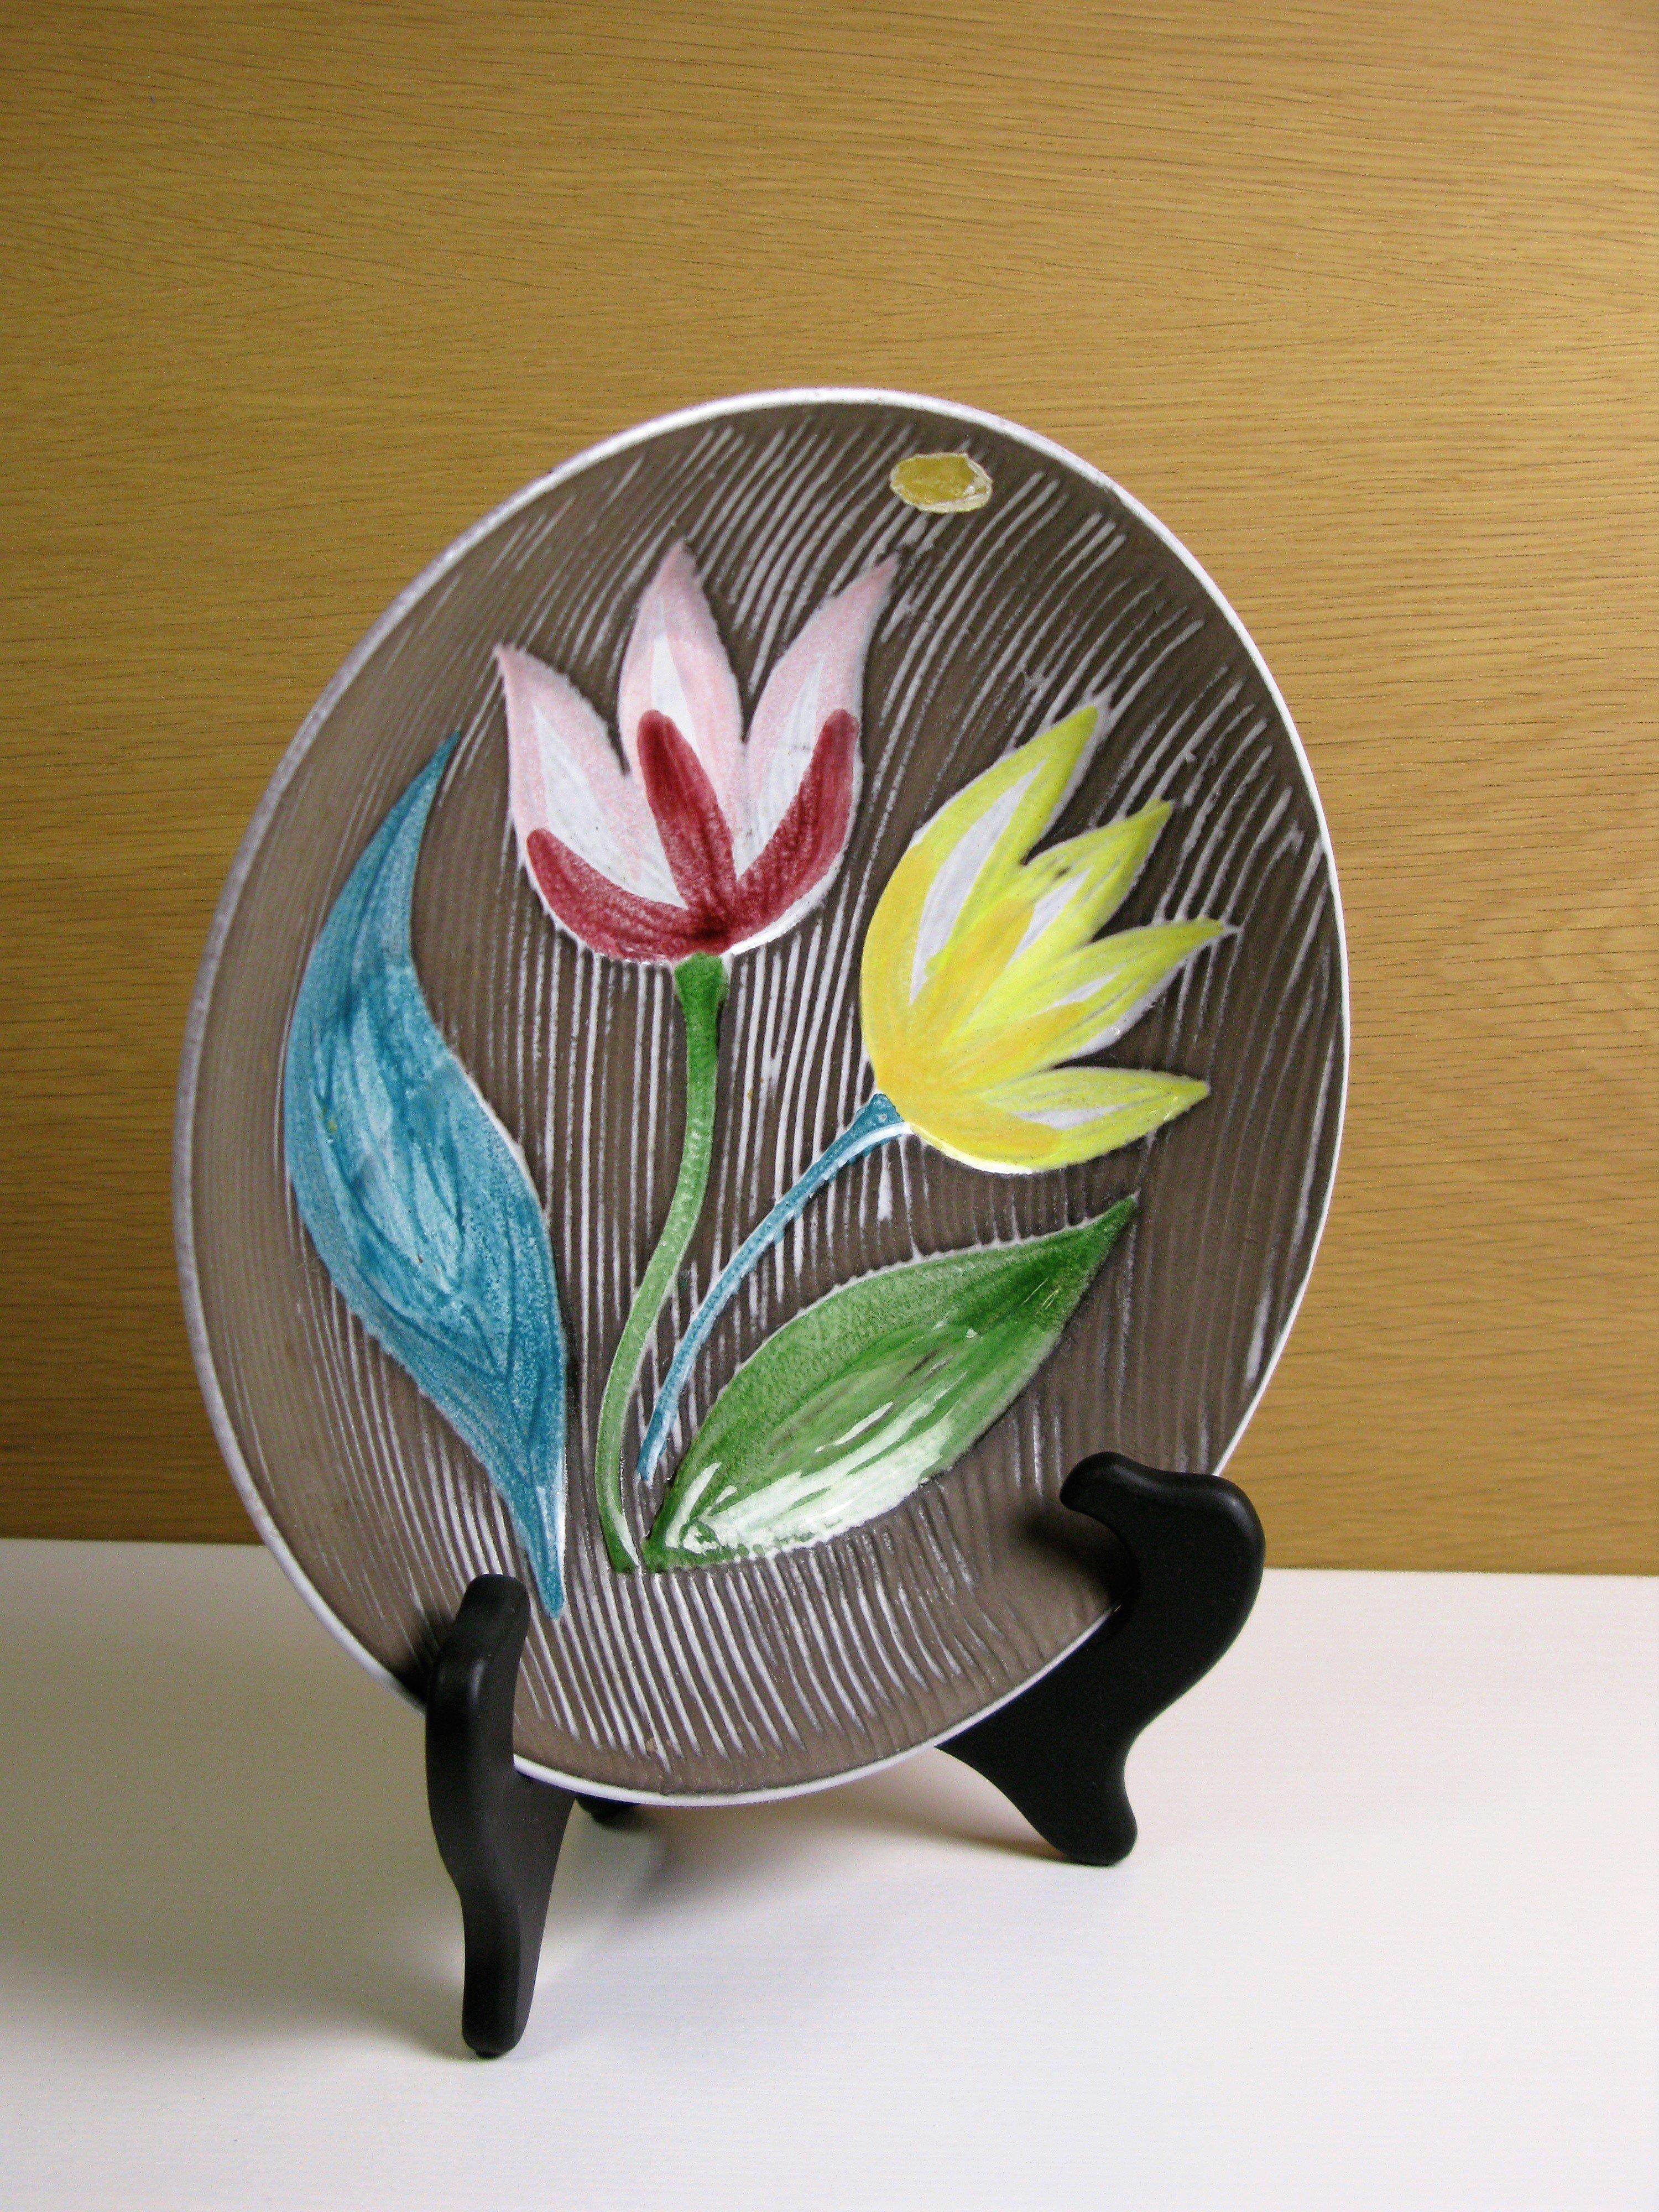 flower bowl 1029/88